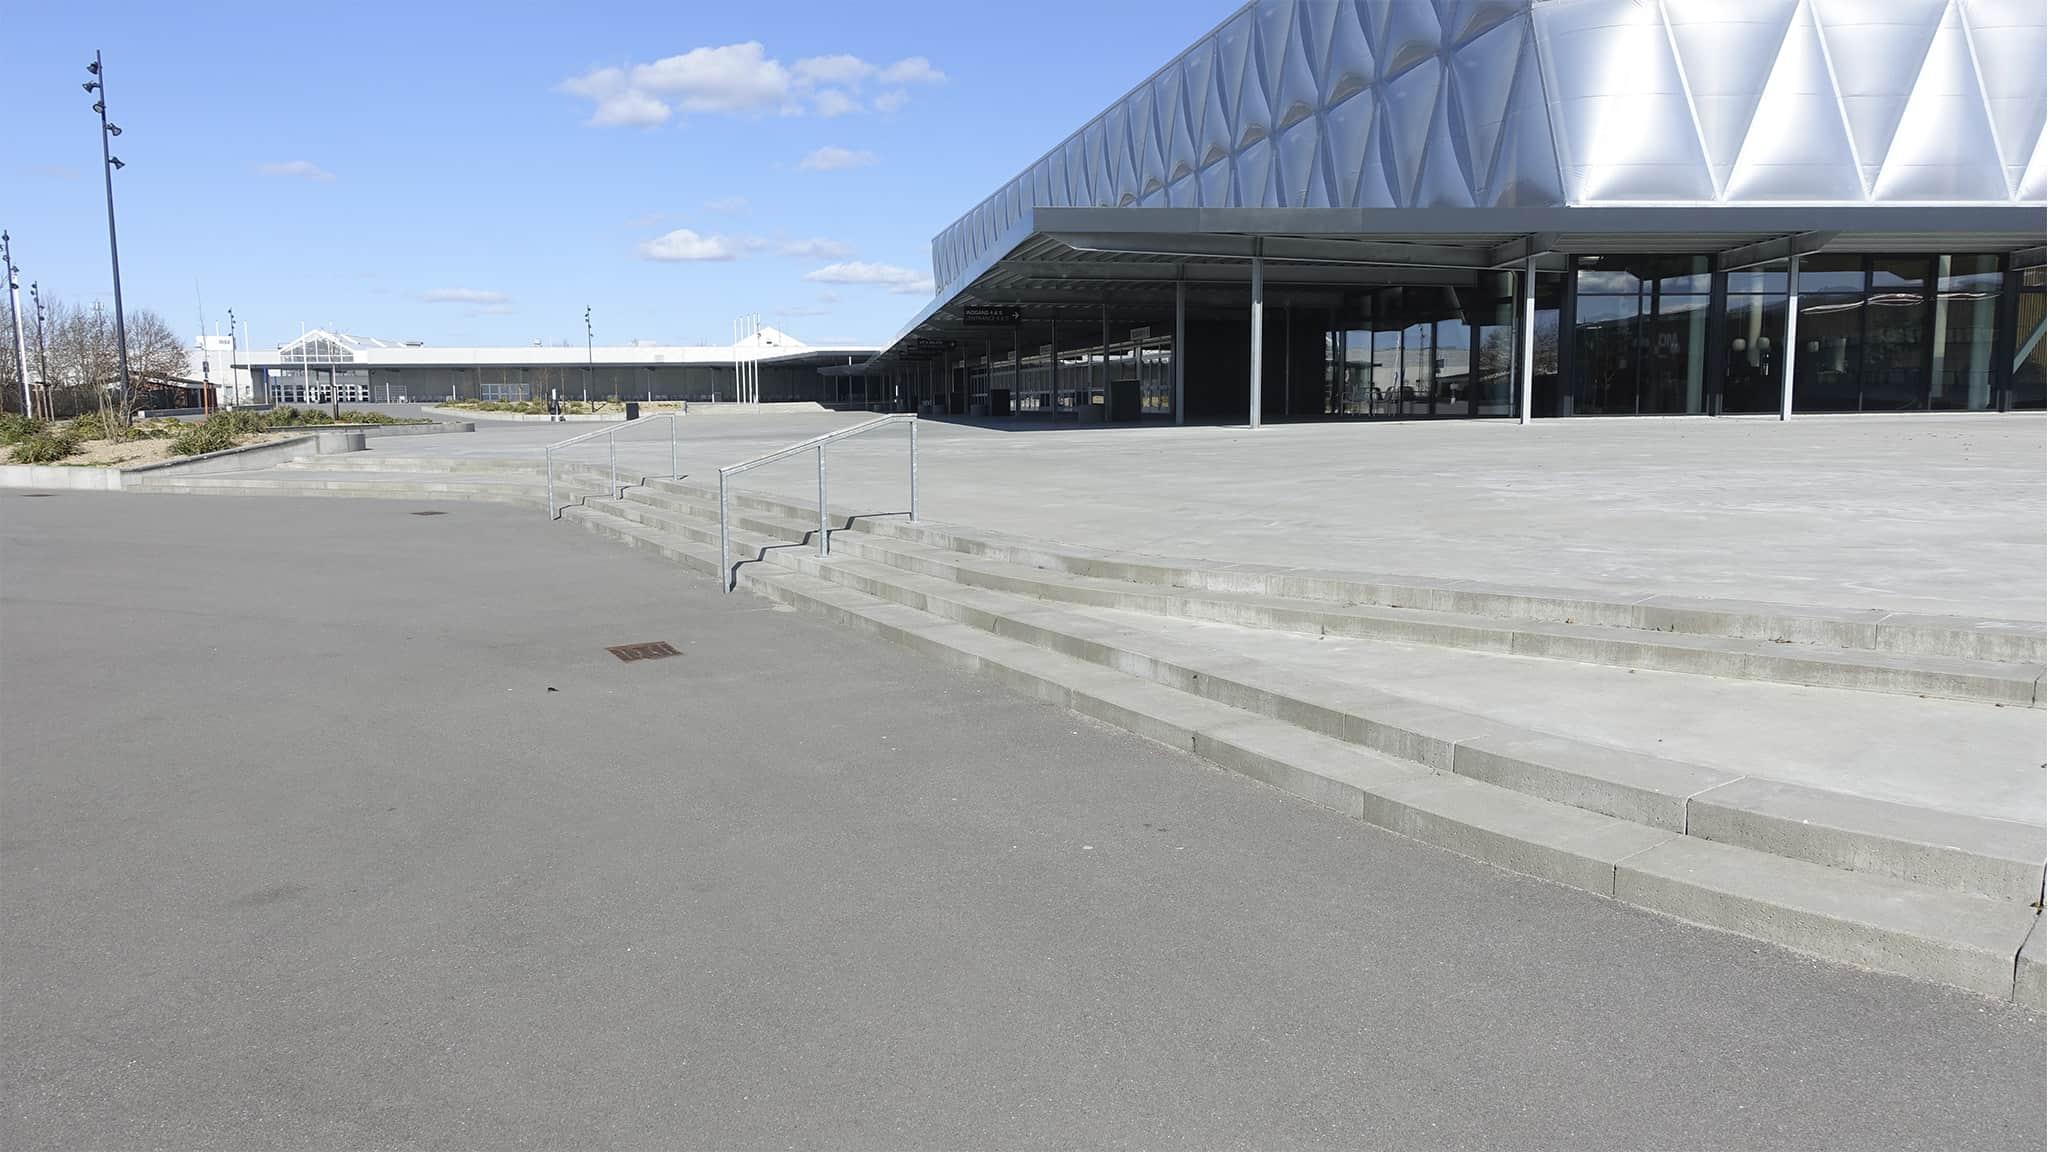 beton_trappetrin_herning